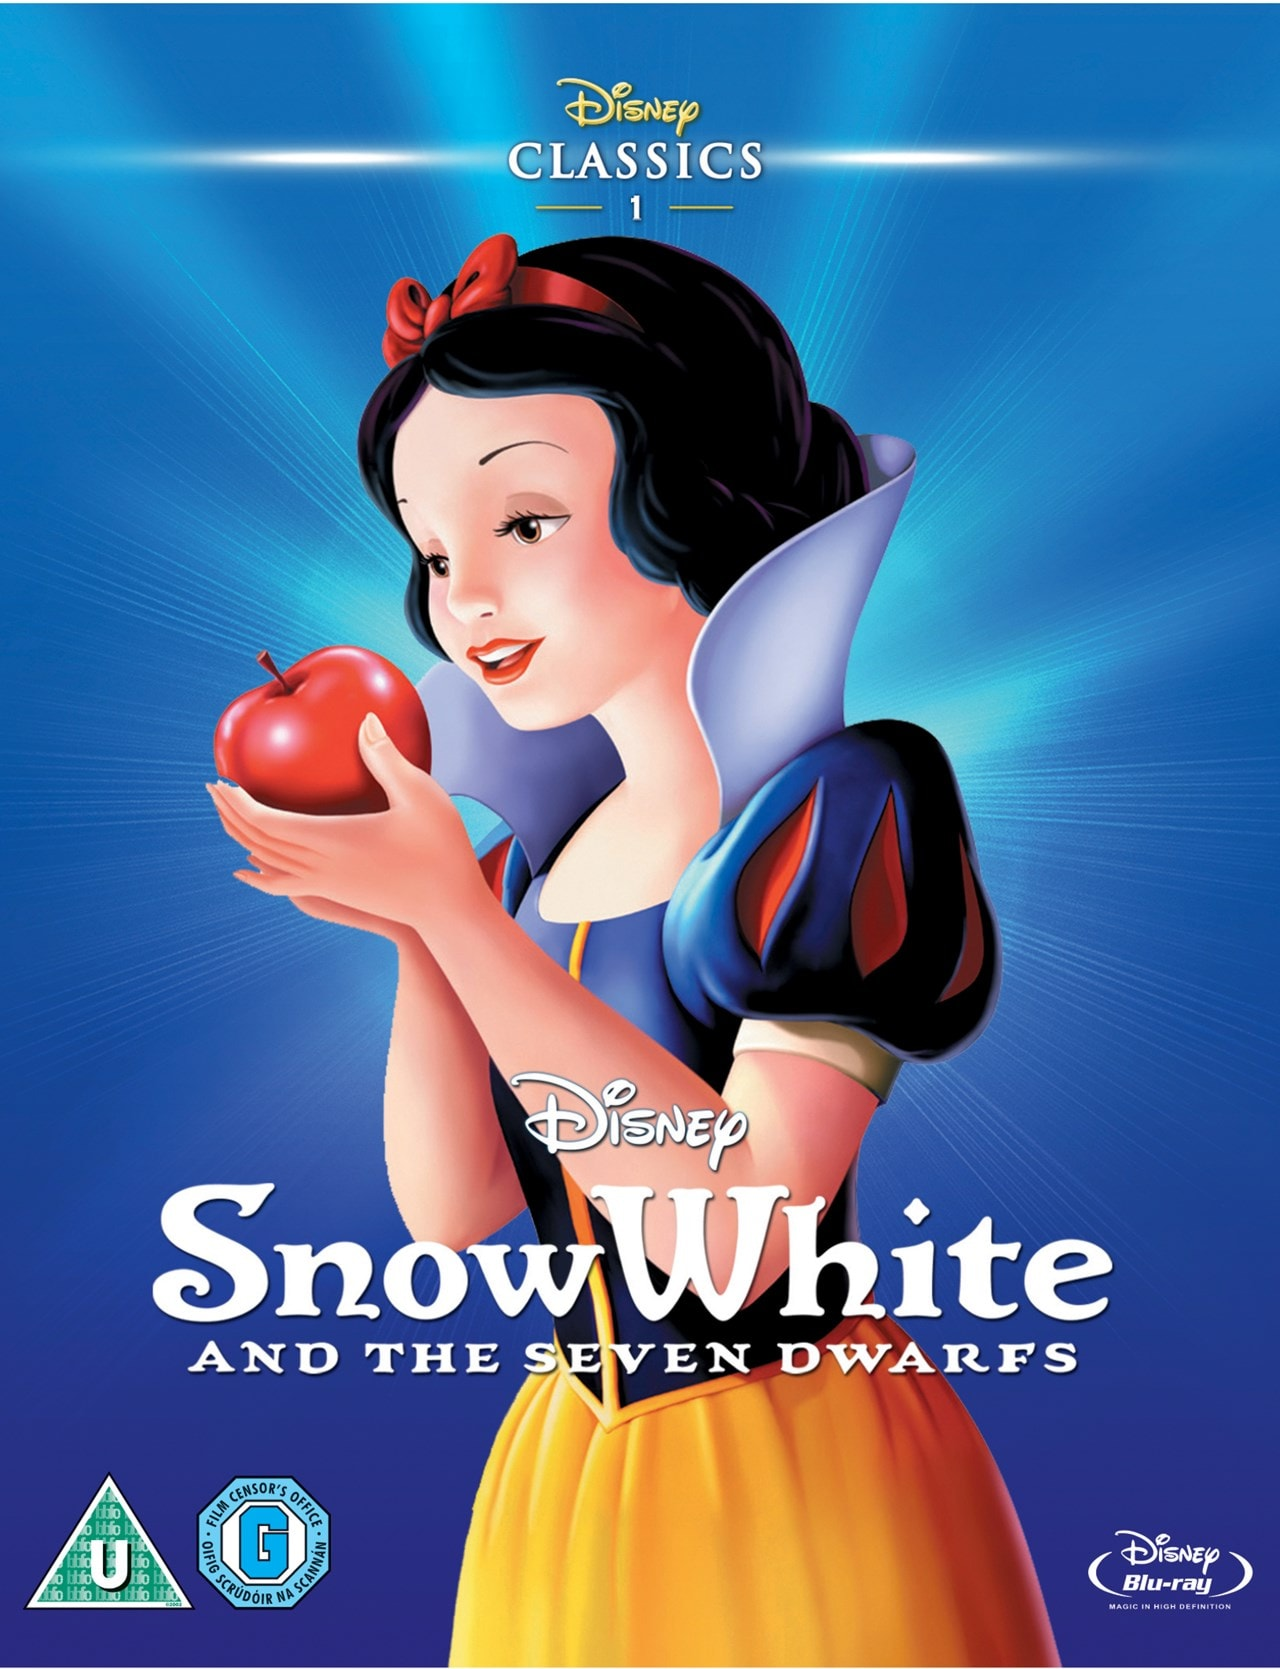 Snow White and the Seven Dwarfs (Disney) - 1